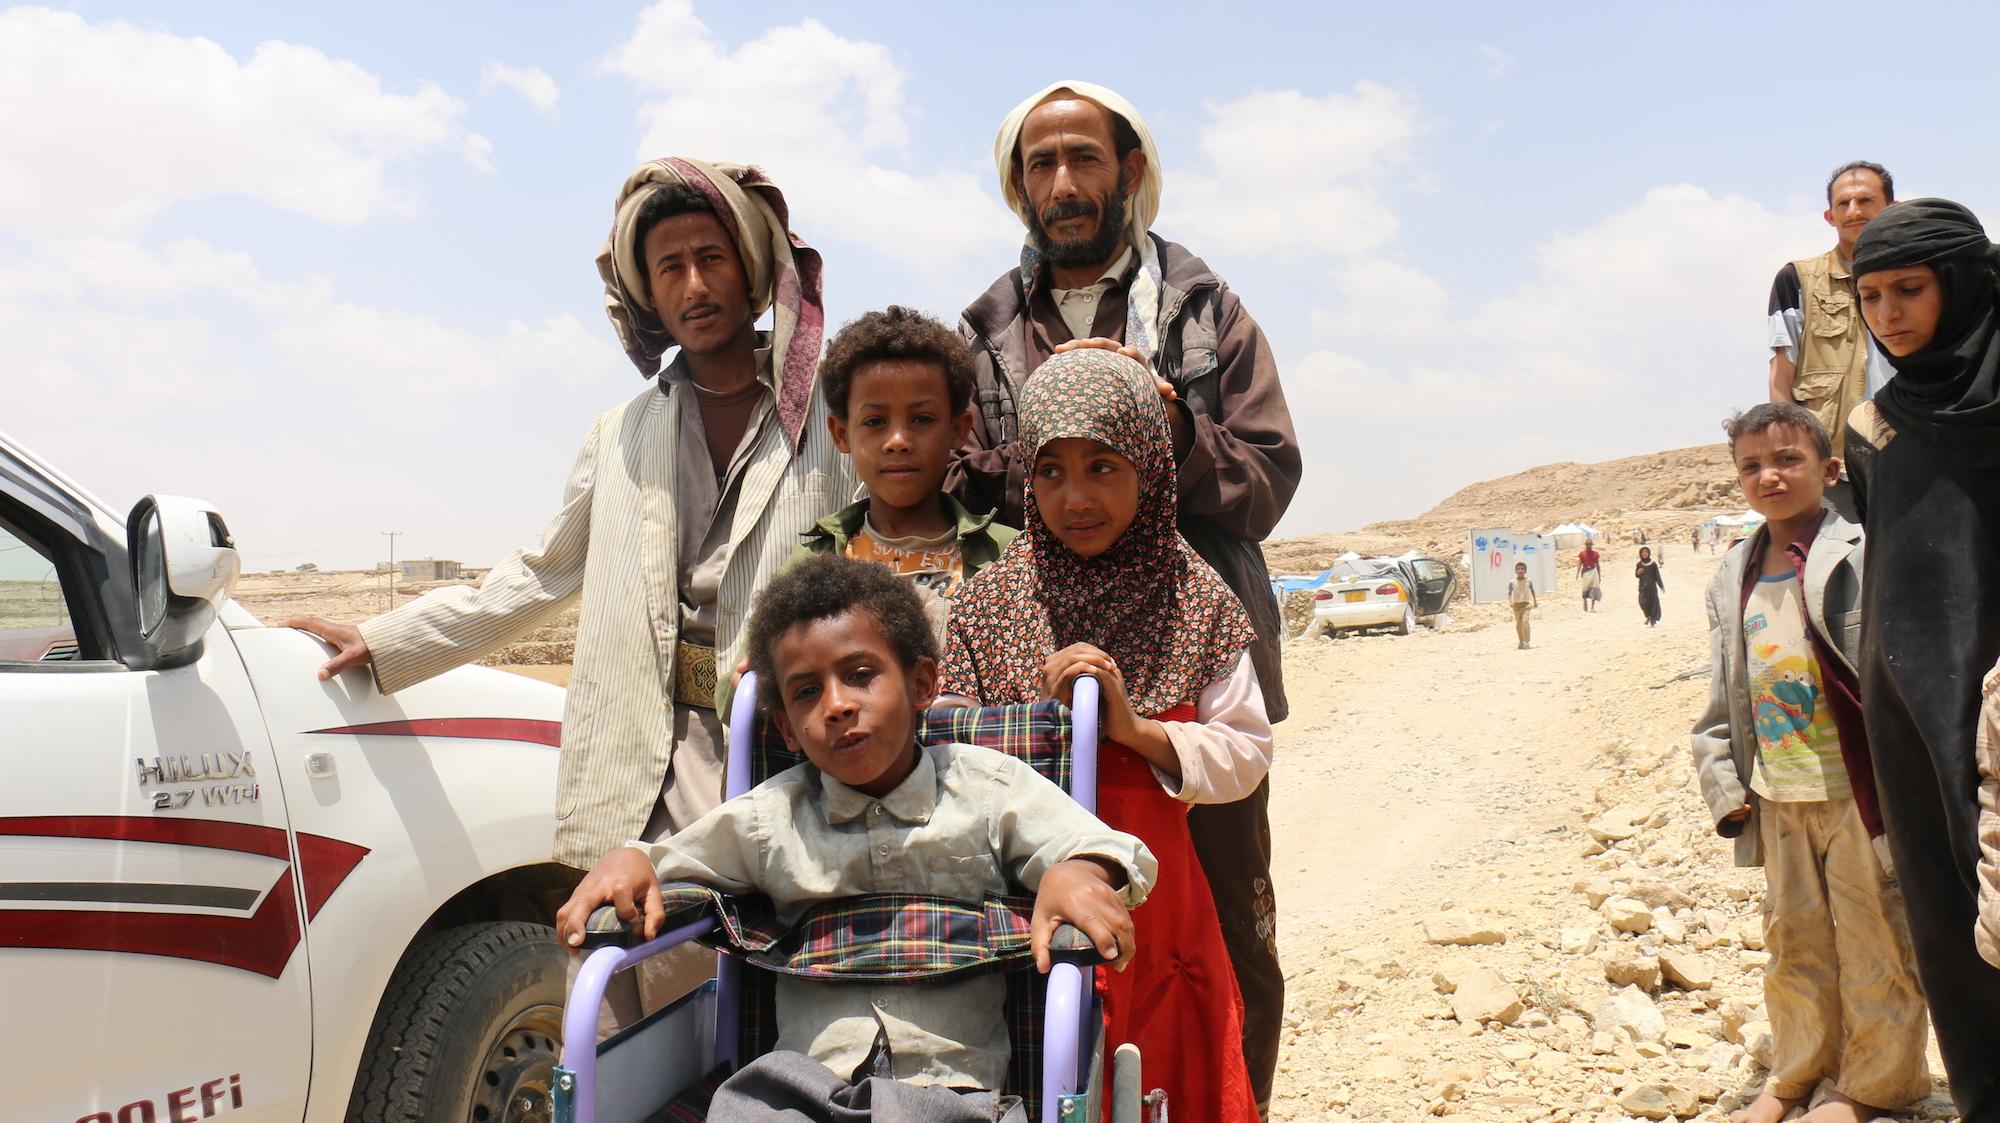 Saudi Arabia-led coalition continue to indiscriminately bomb and kill civilians in Yemen.